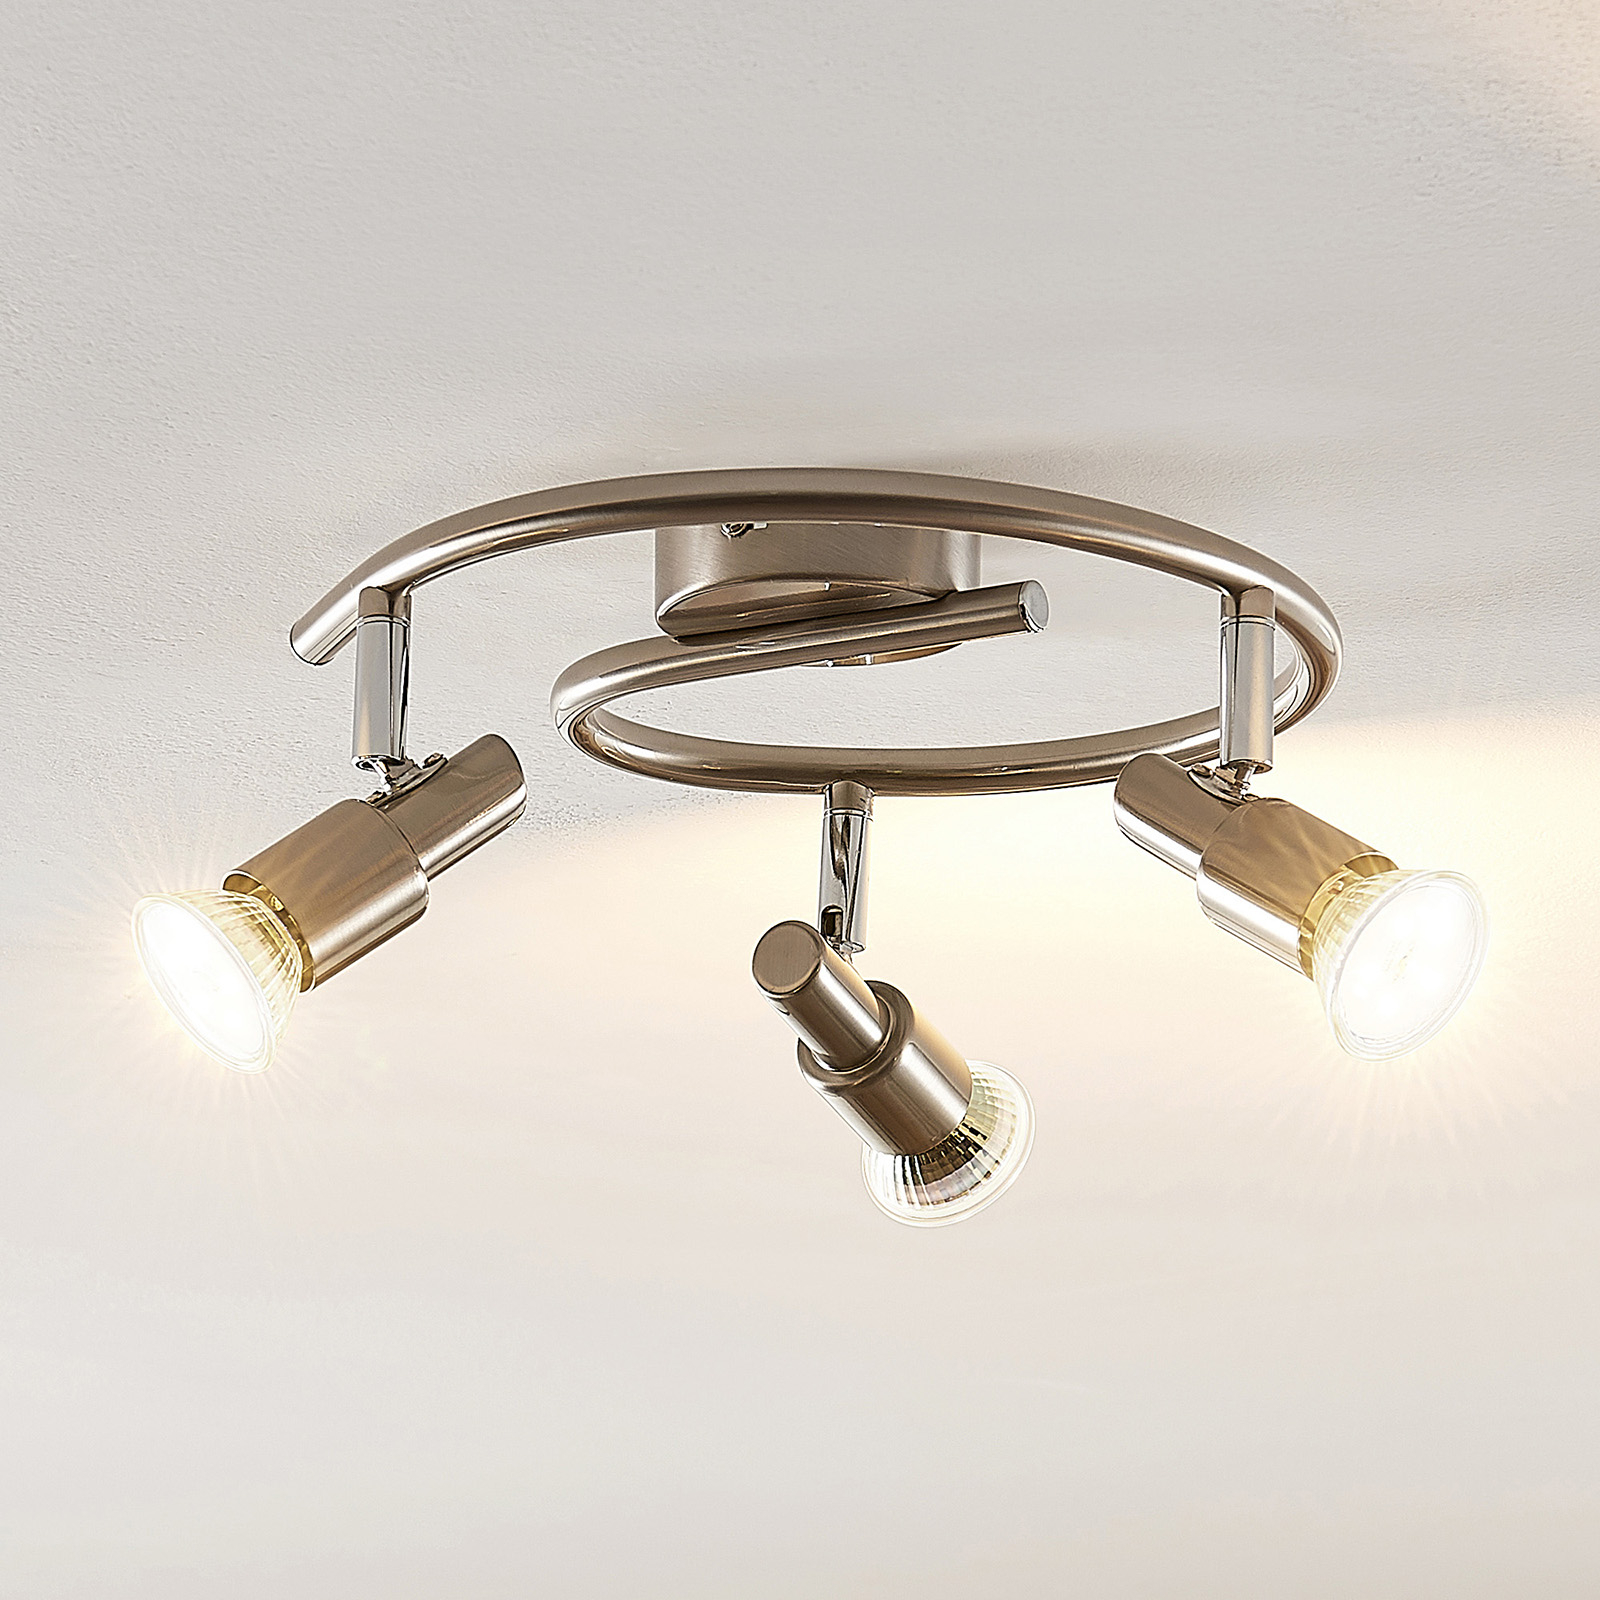 ELC Farida LED-taklampa, nickel, 3 lampor